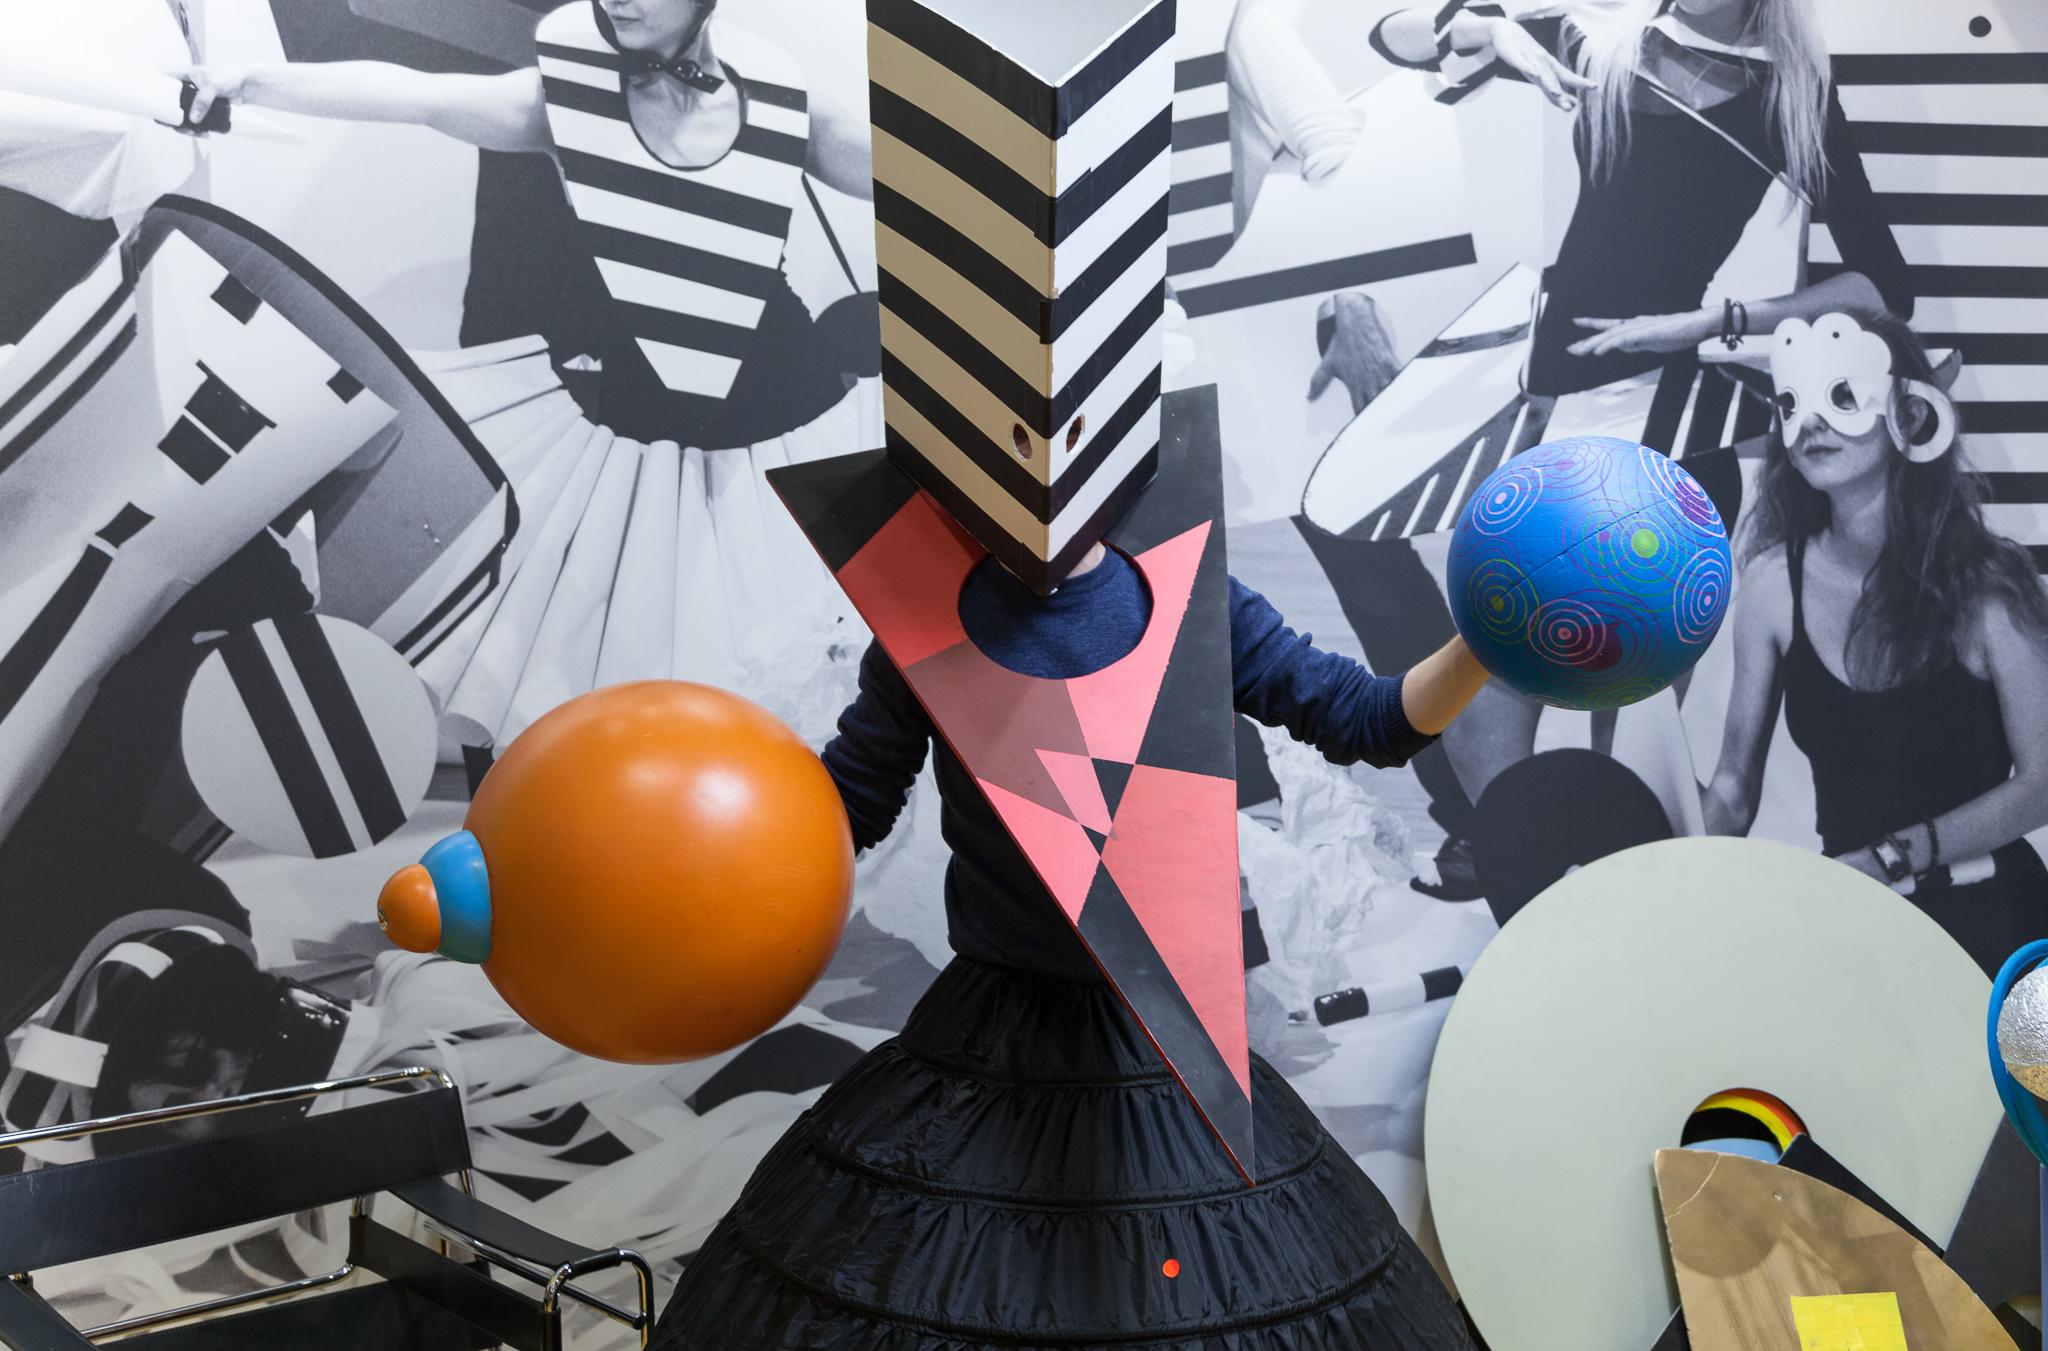 bauhaus from kinetics  by Fotostudio bauhausformkinetics 2019 3 - Tel Aviv abre las puertas del White City Center con motivo del centenario de la Bauhaus